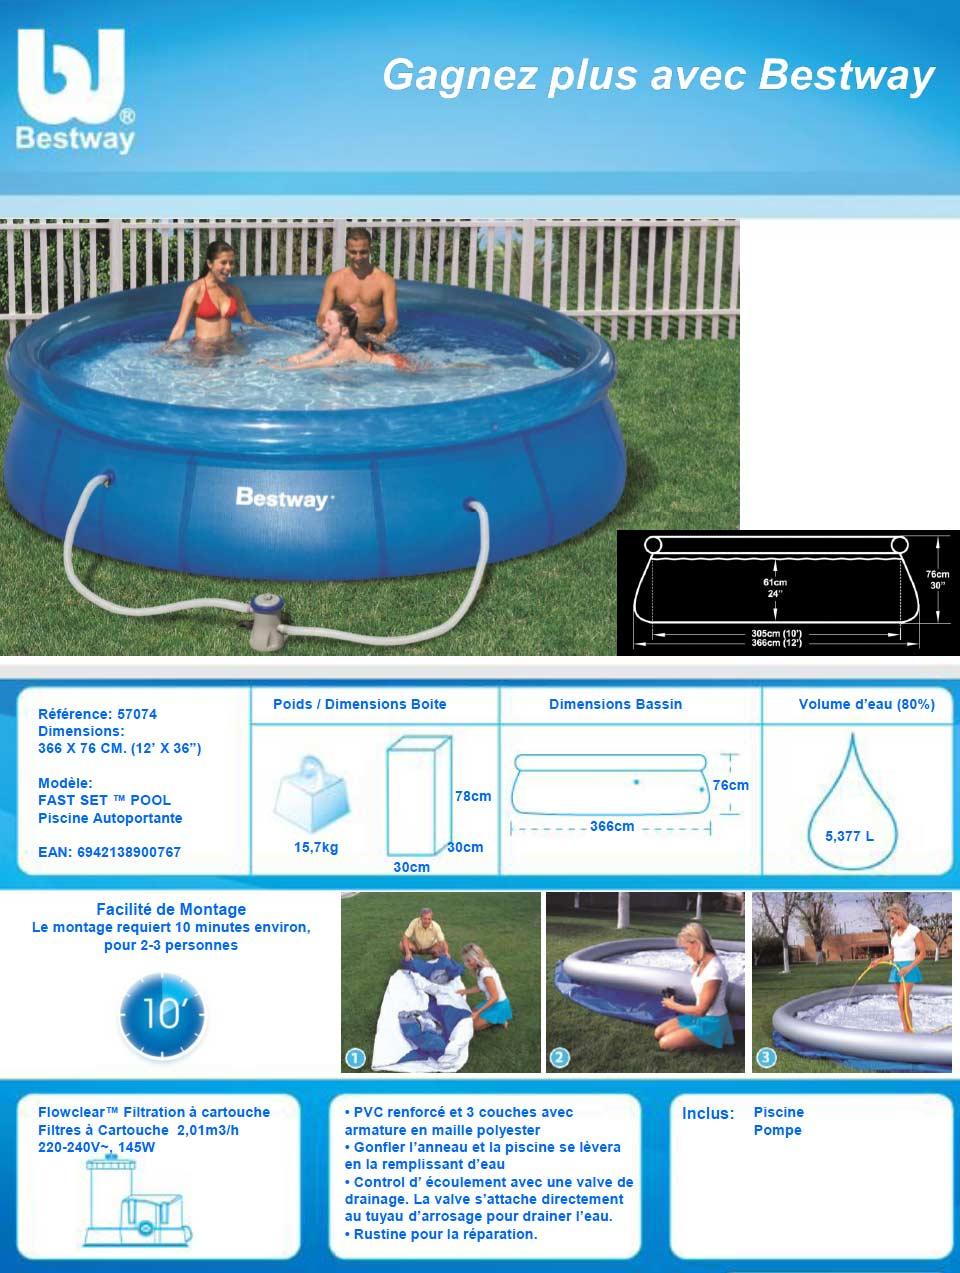 Fiche piscine autoportante Bestway